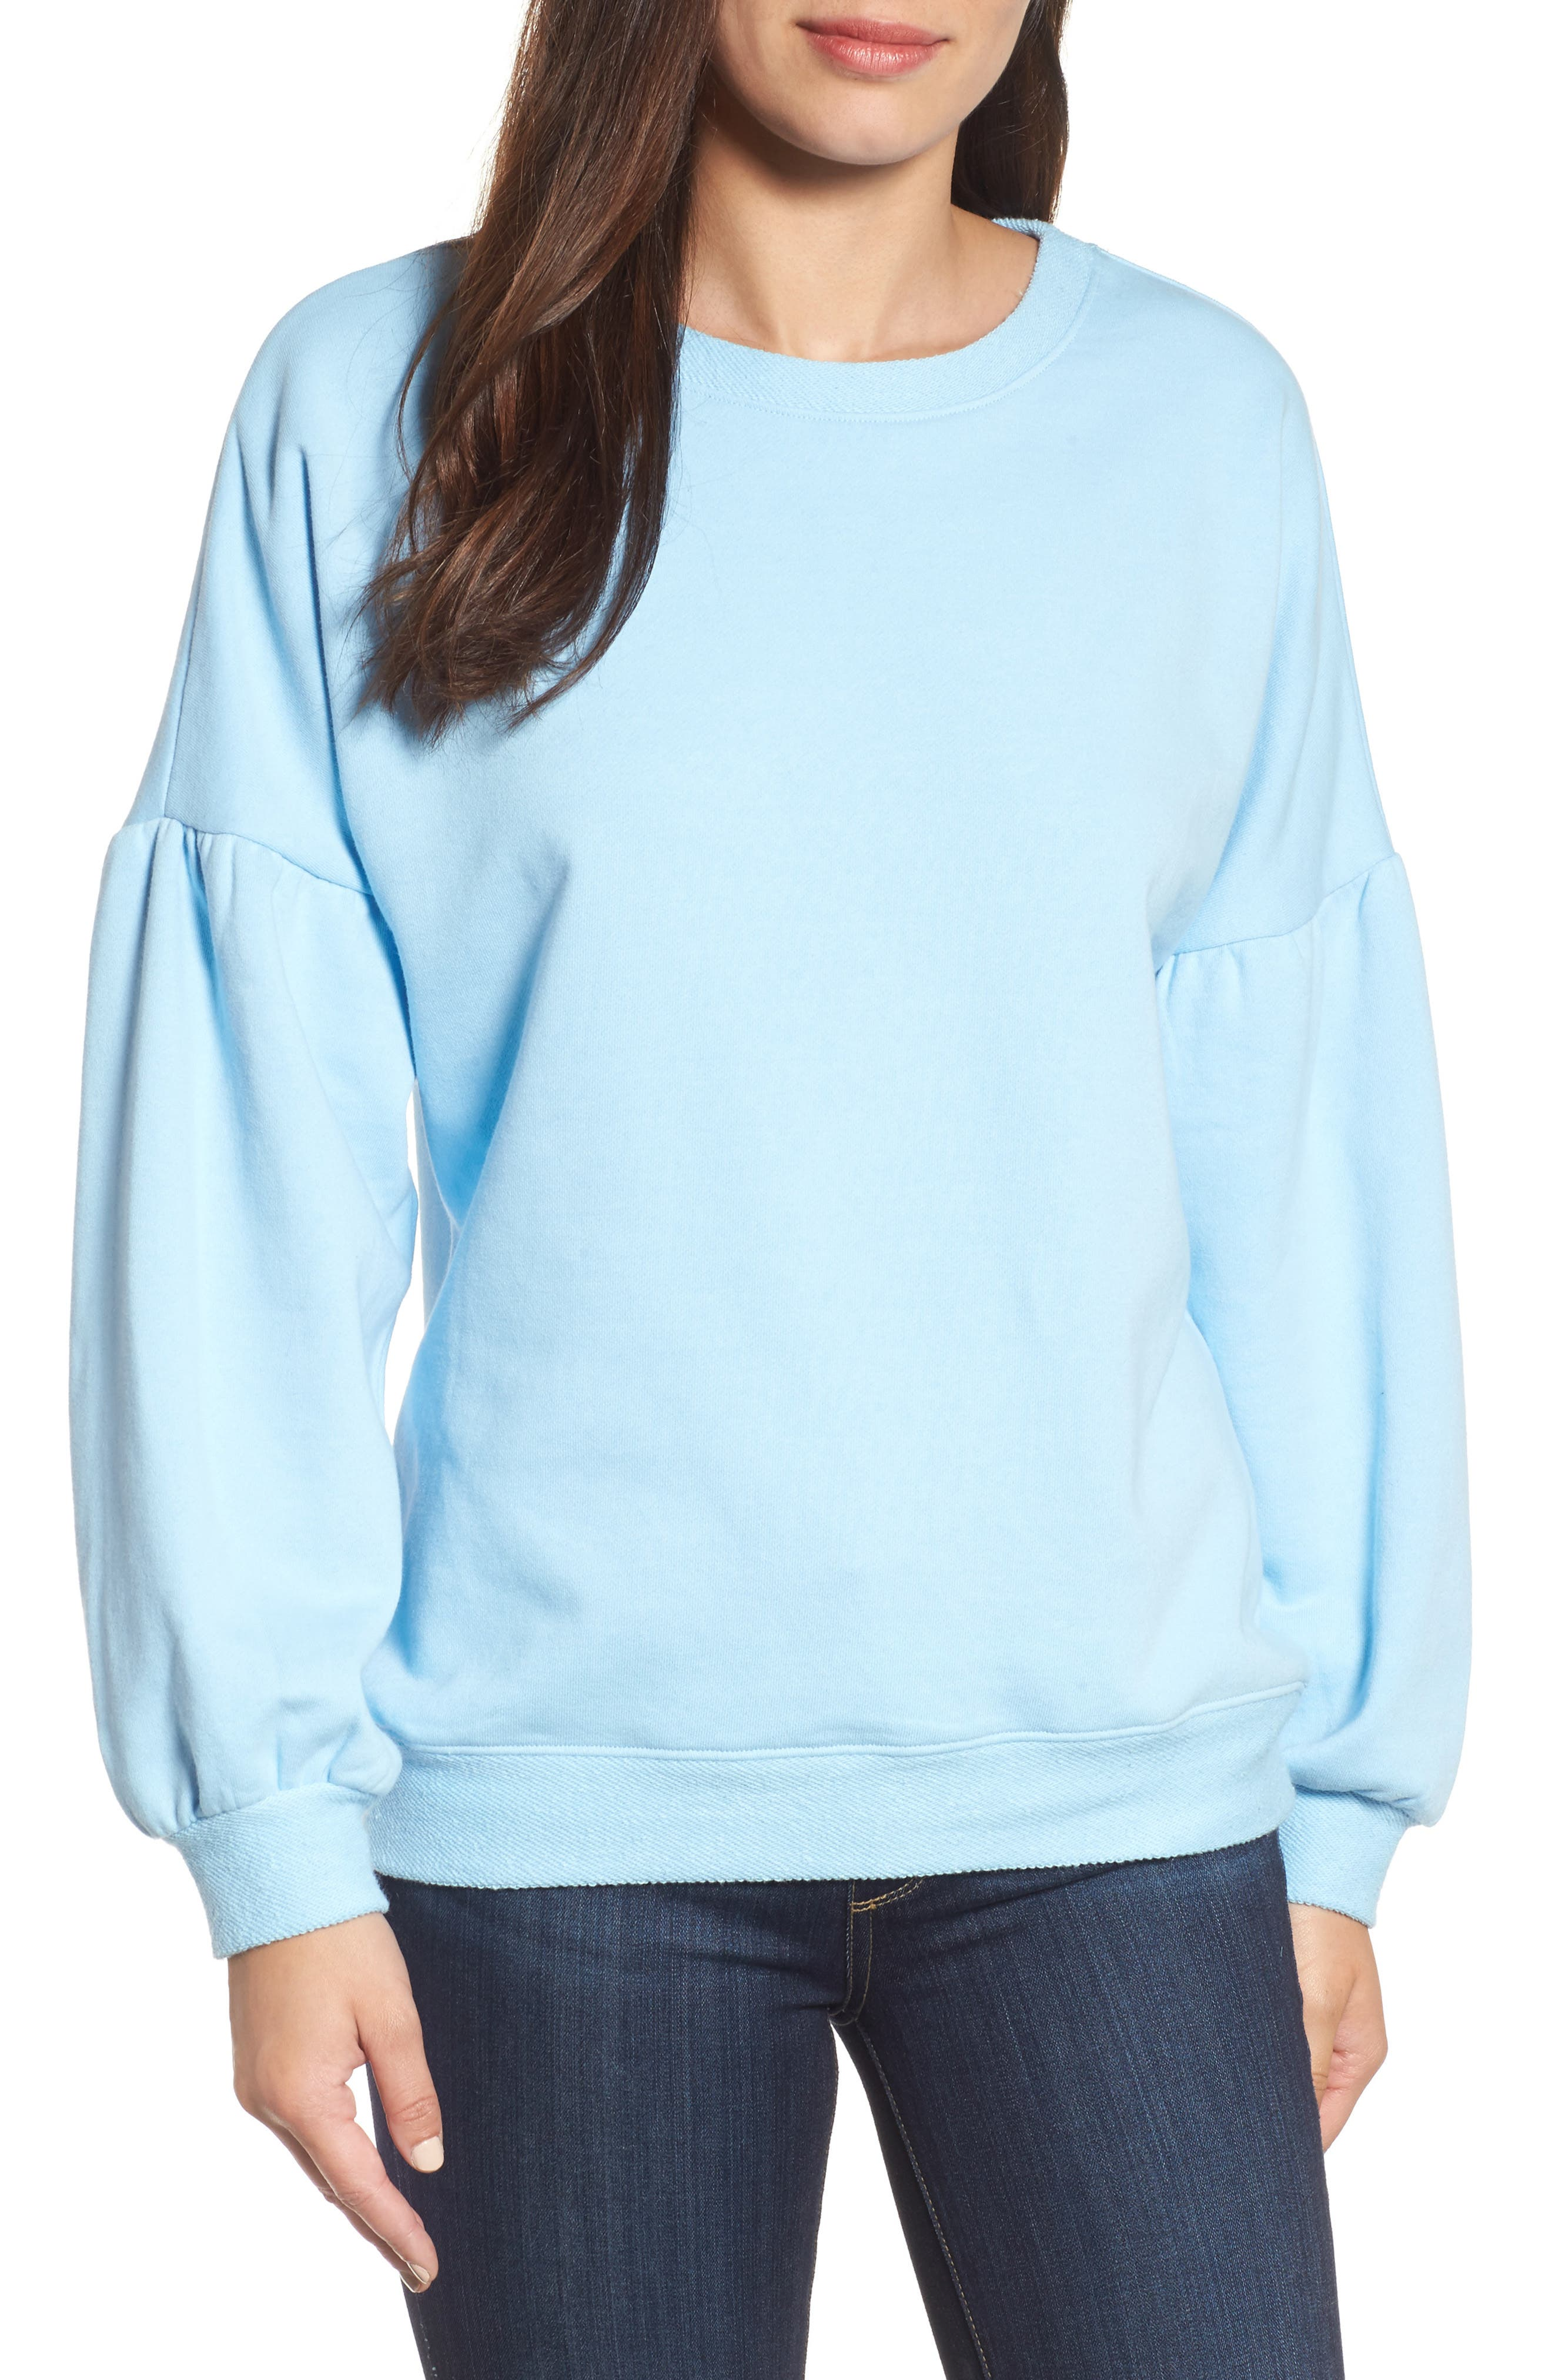 Alternate Image 1 Selected - KUT from the Kloth Allesia Sweatshirt